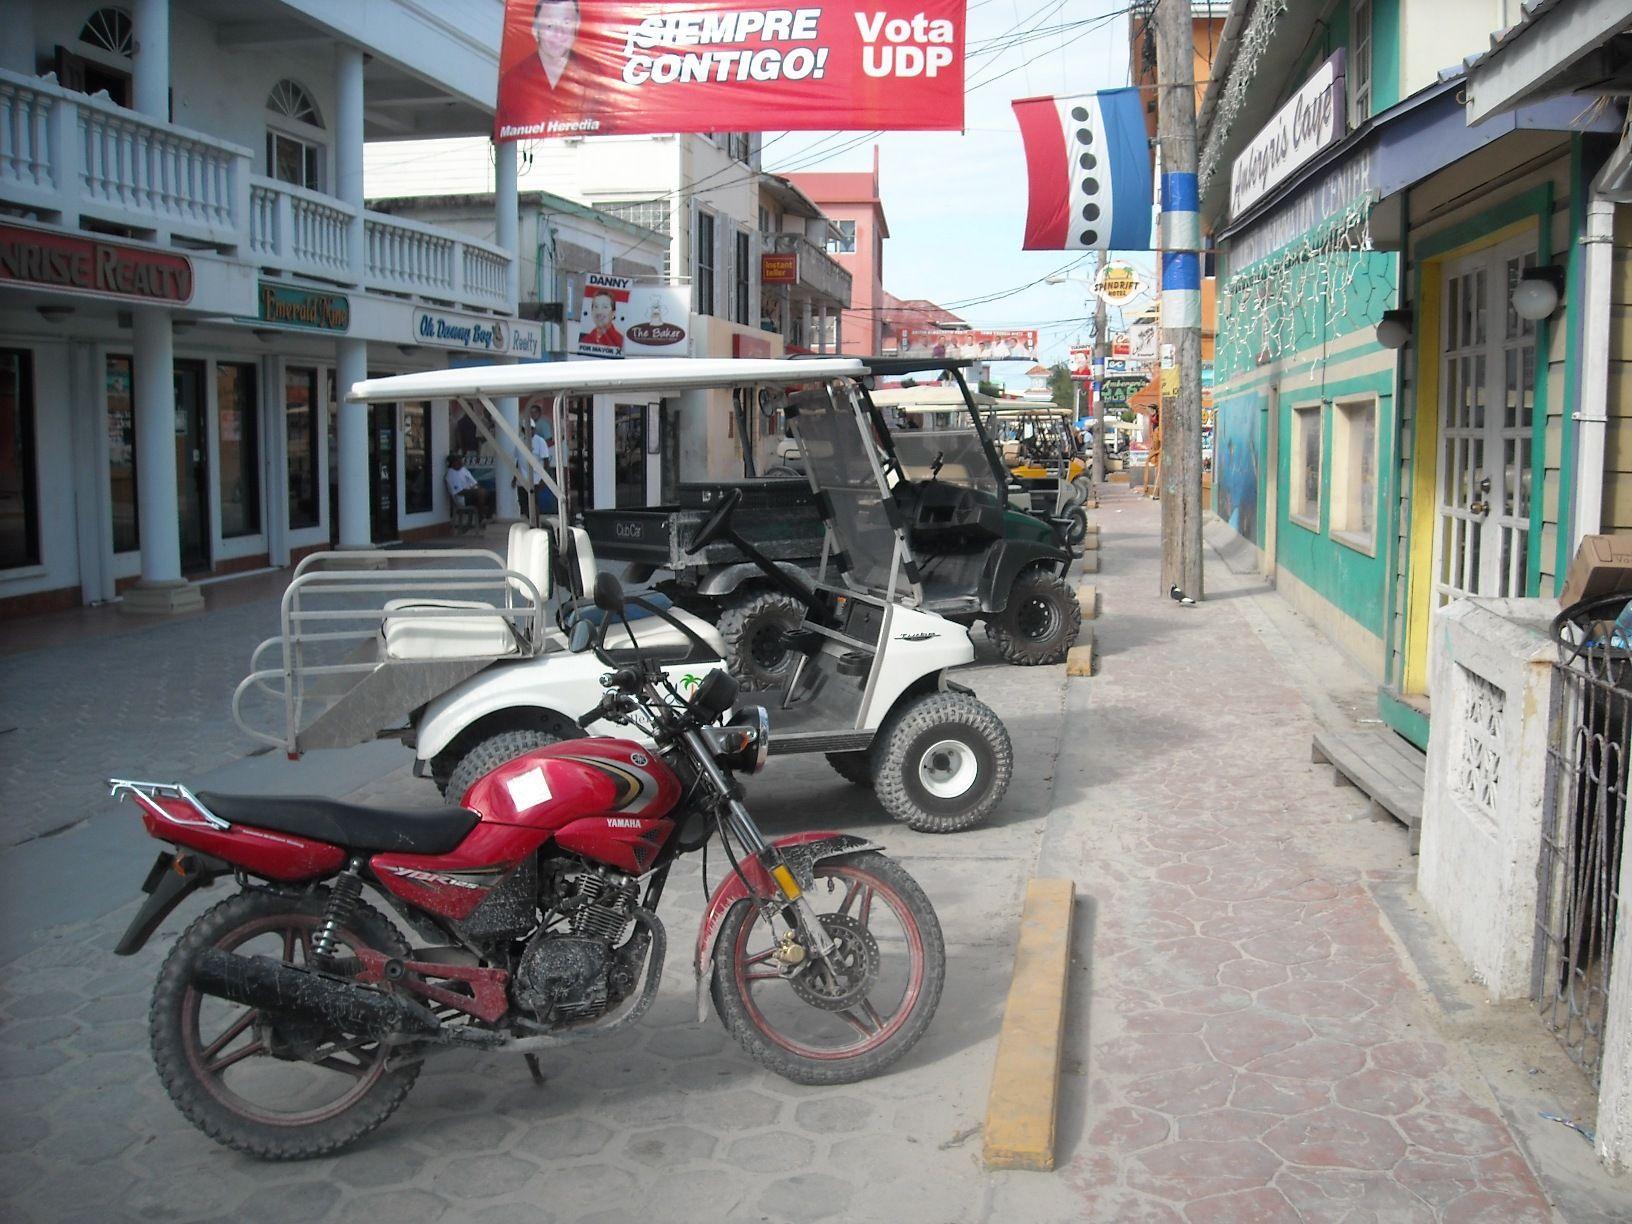 Motorcycling on San Pedro, Belize.